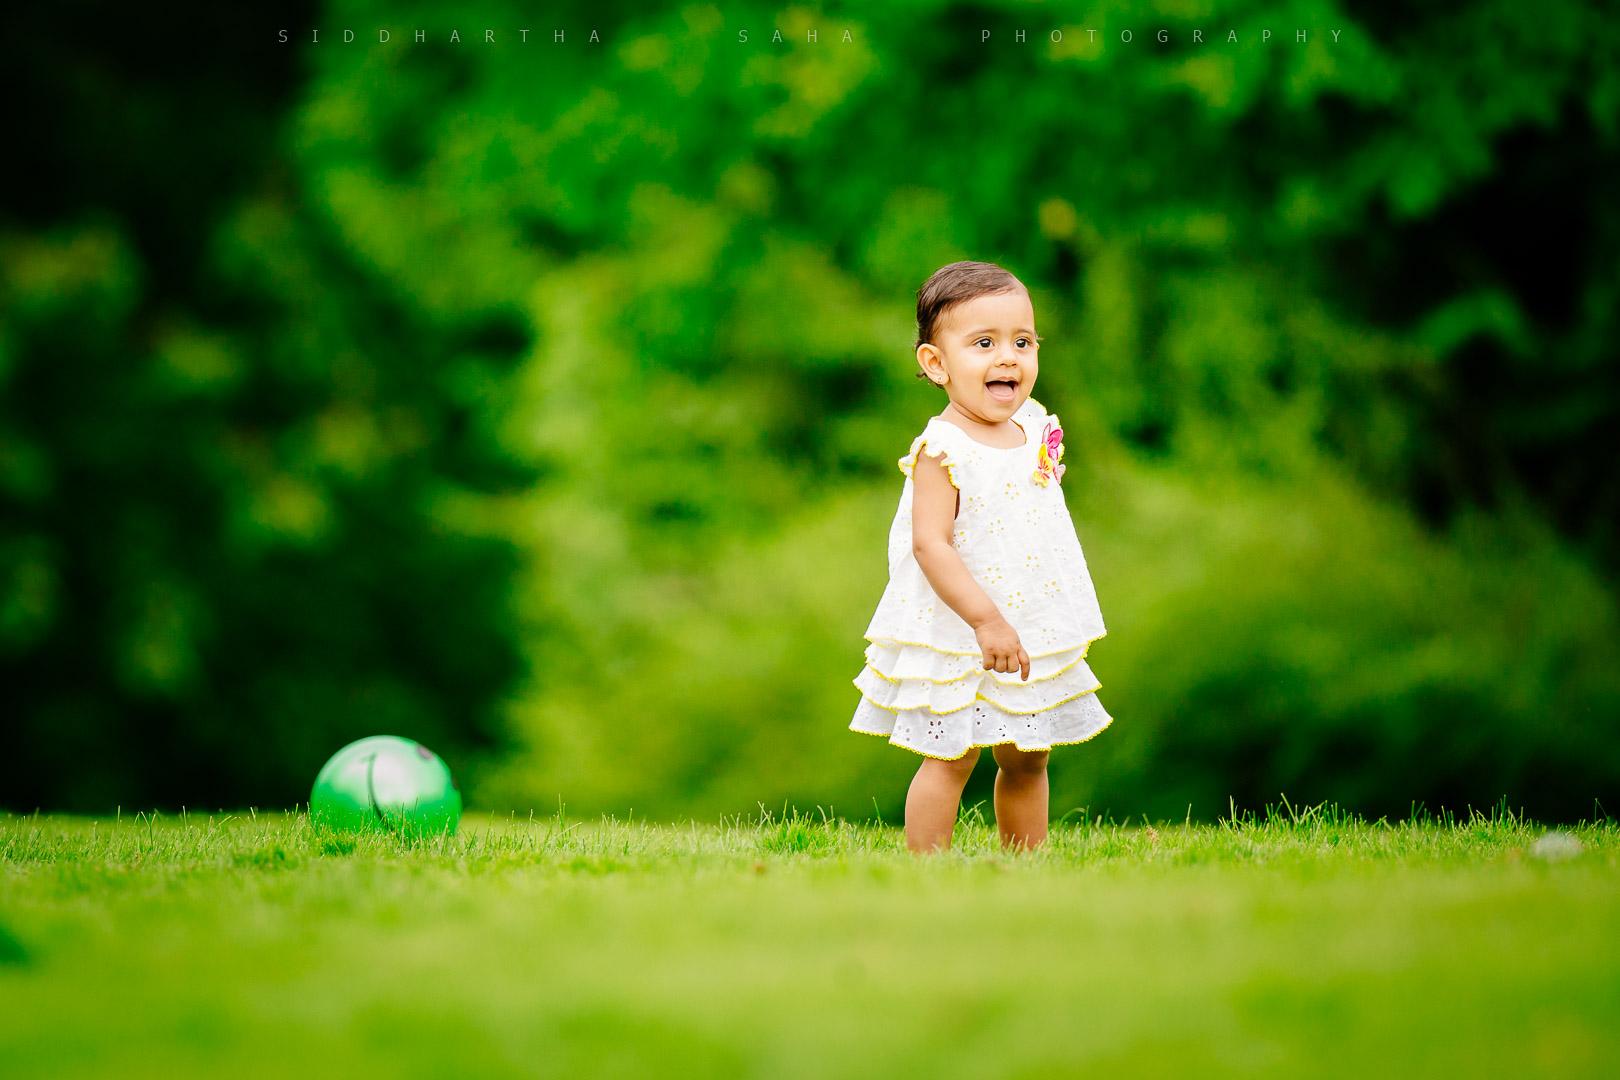 2015-08-08 - Padmaja Ketan Family Photoshoot - _05Y8178